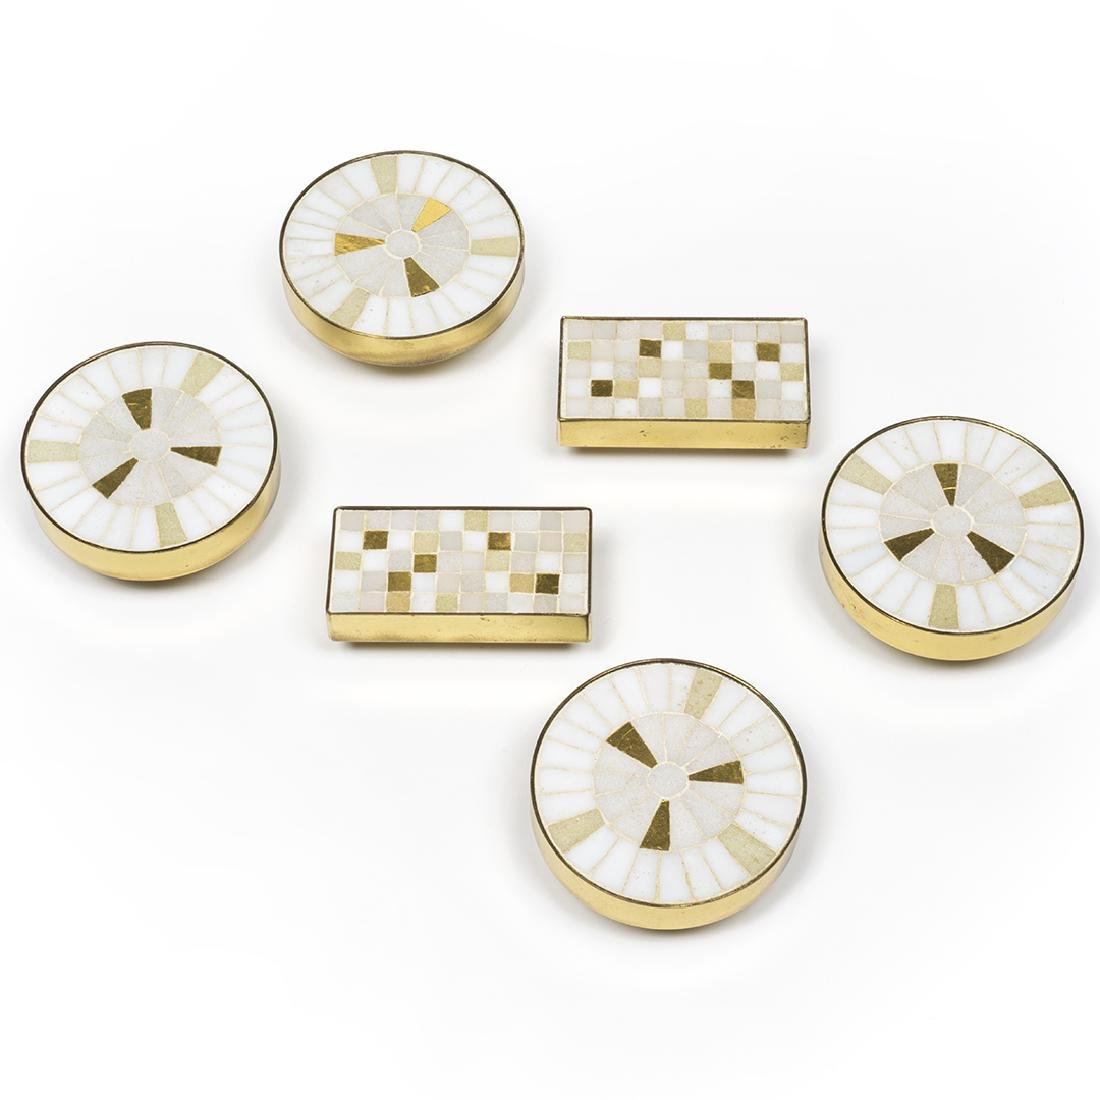 Tiled Brass Cabinet Pulls